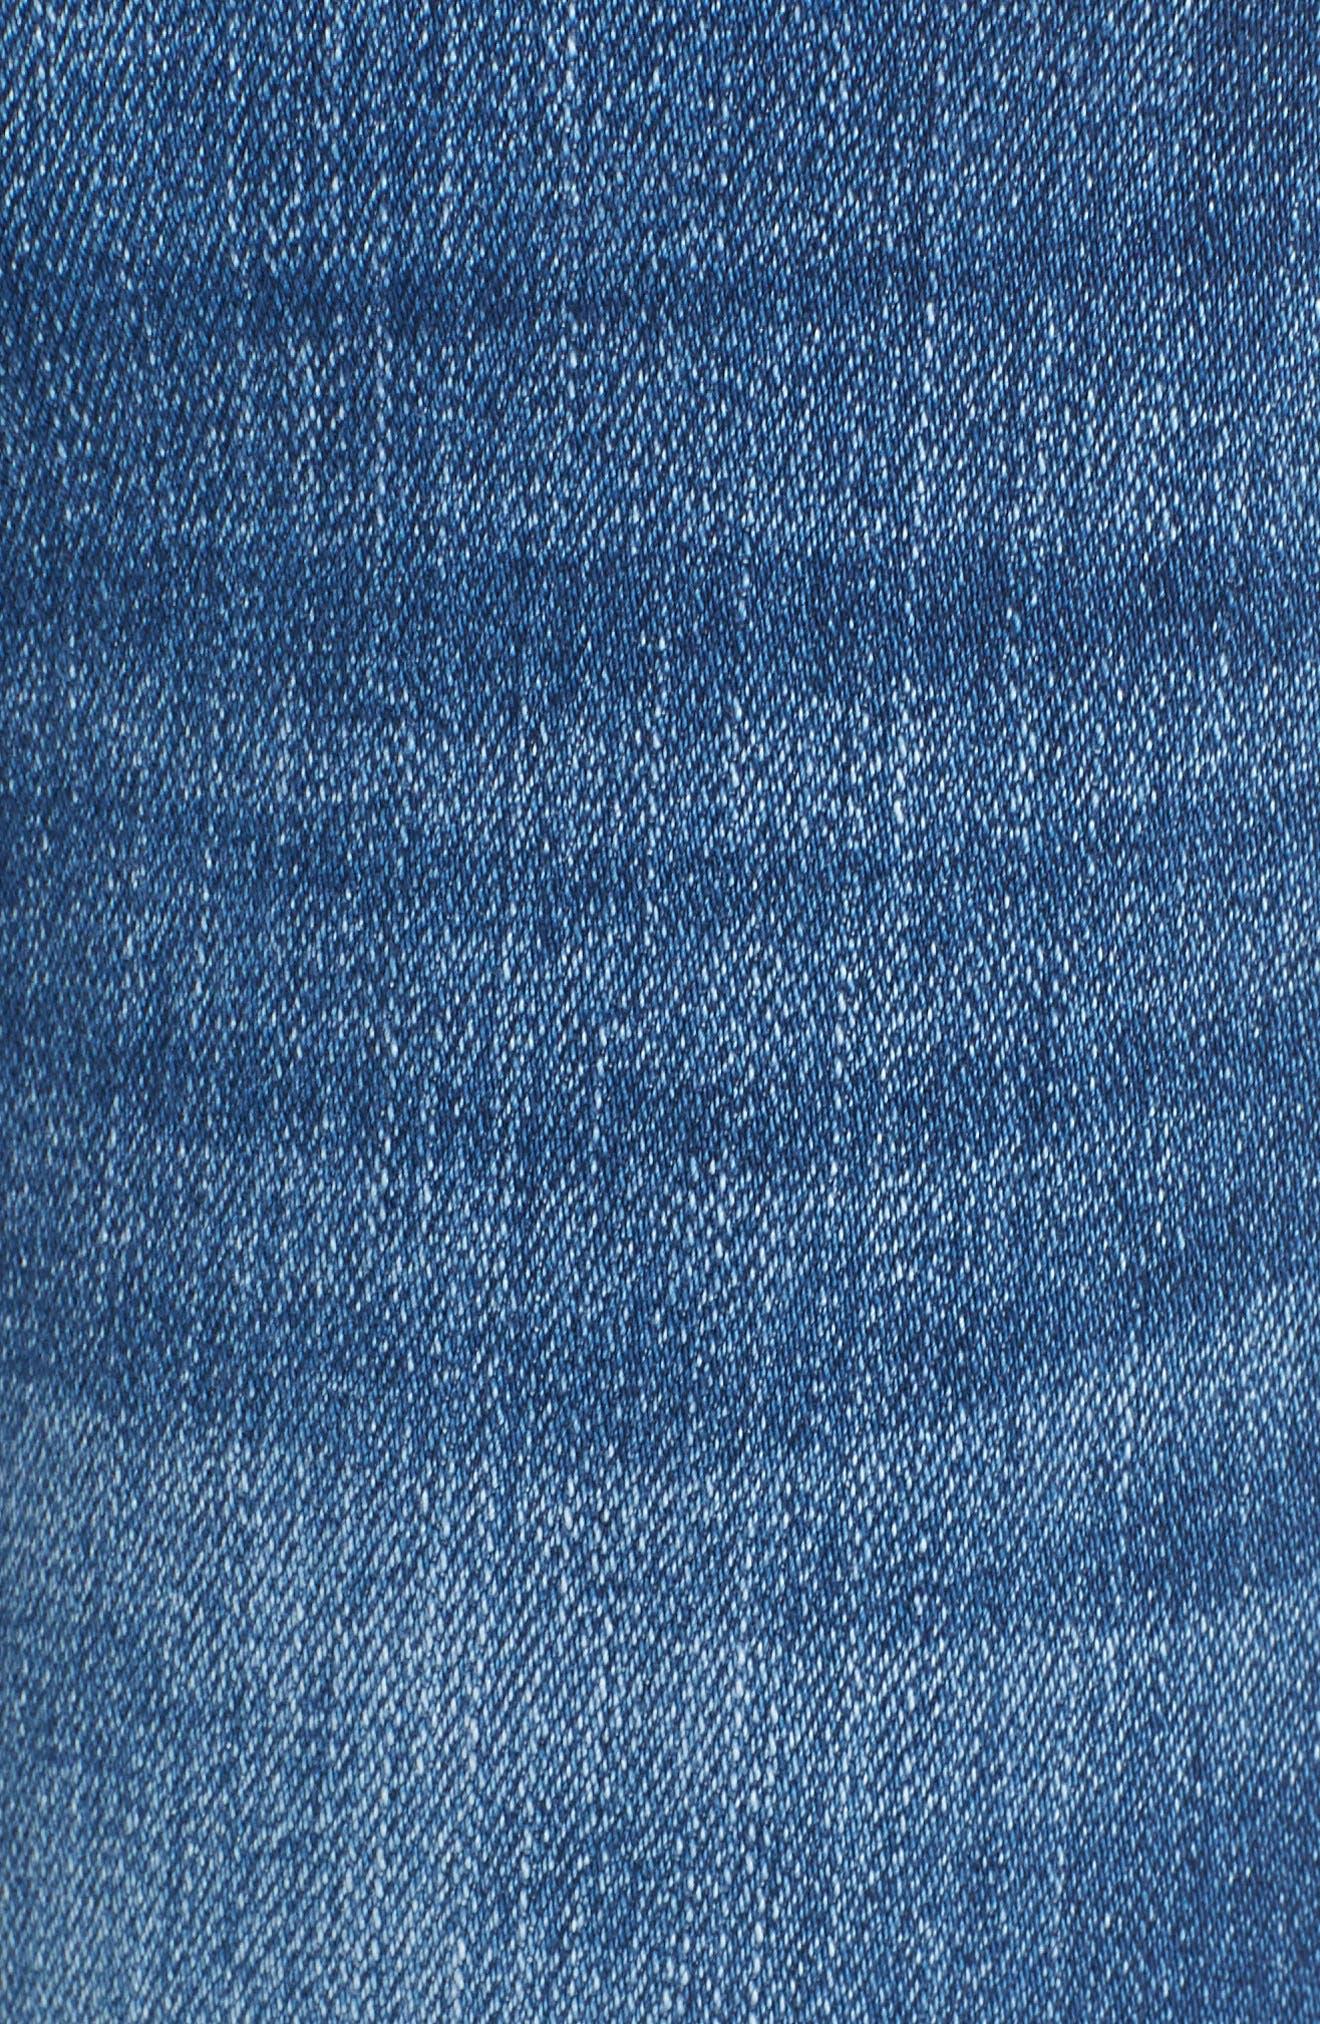 Low Key Judging Fray Hem Skinny Jeans,                             Alternate thumbnail 6, color,                             400